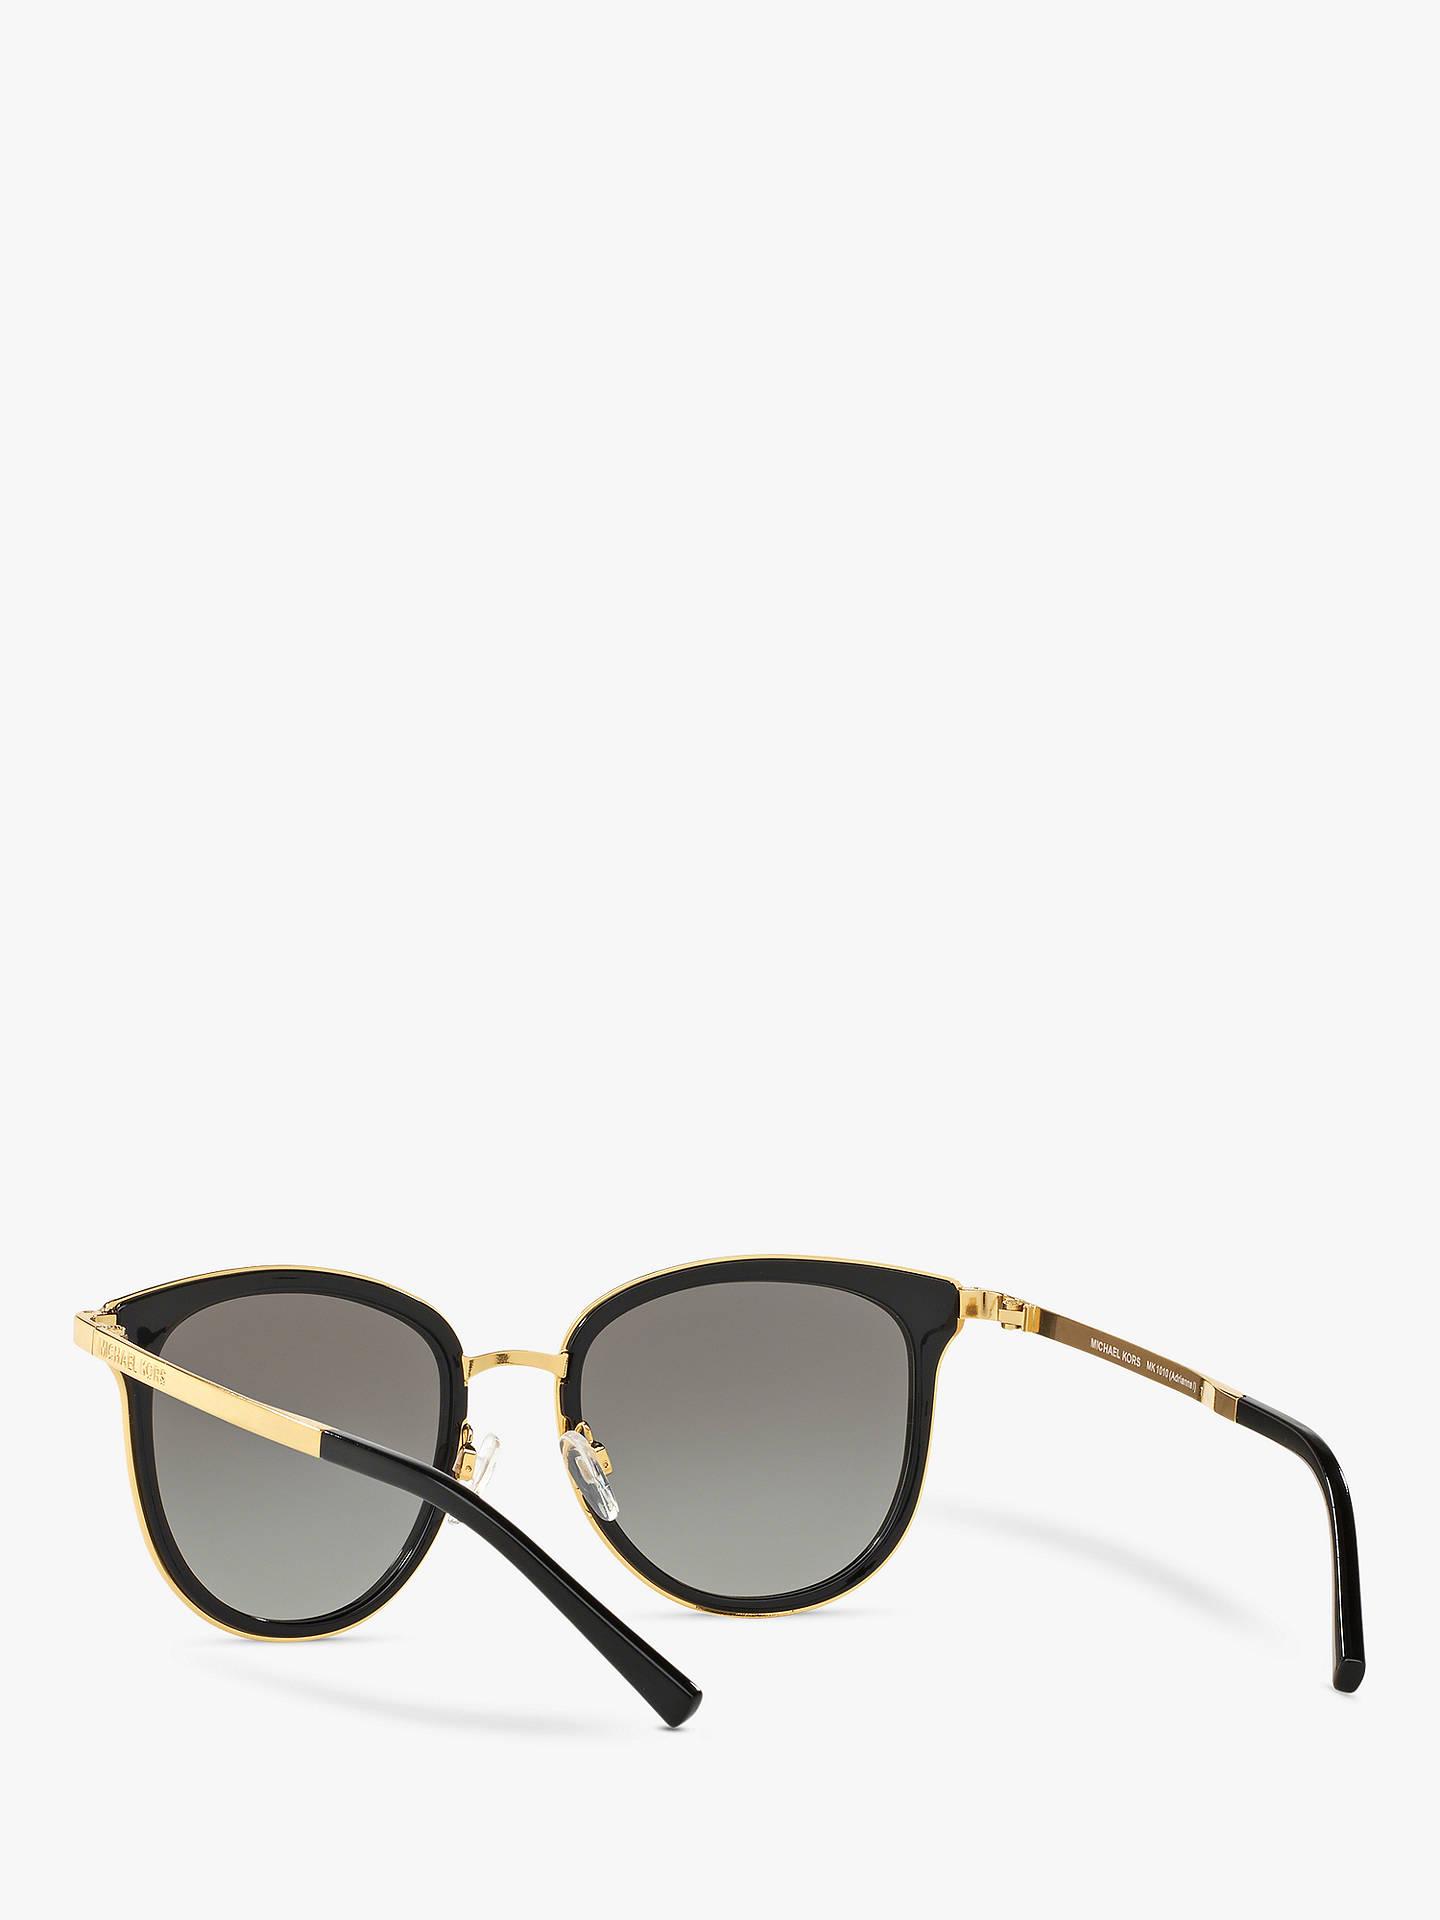 e871cb2e29d9f Michael Kors MK1010 Adrianna Oval Sunglasses at John Lewis   Partners